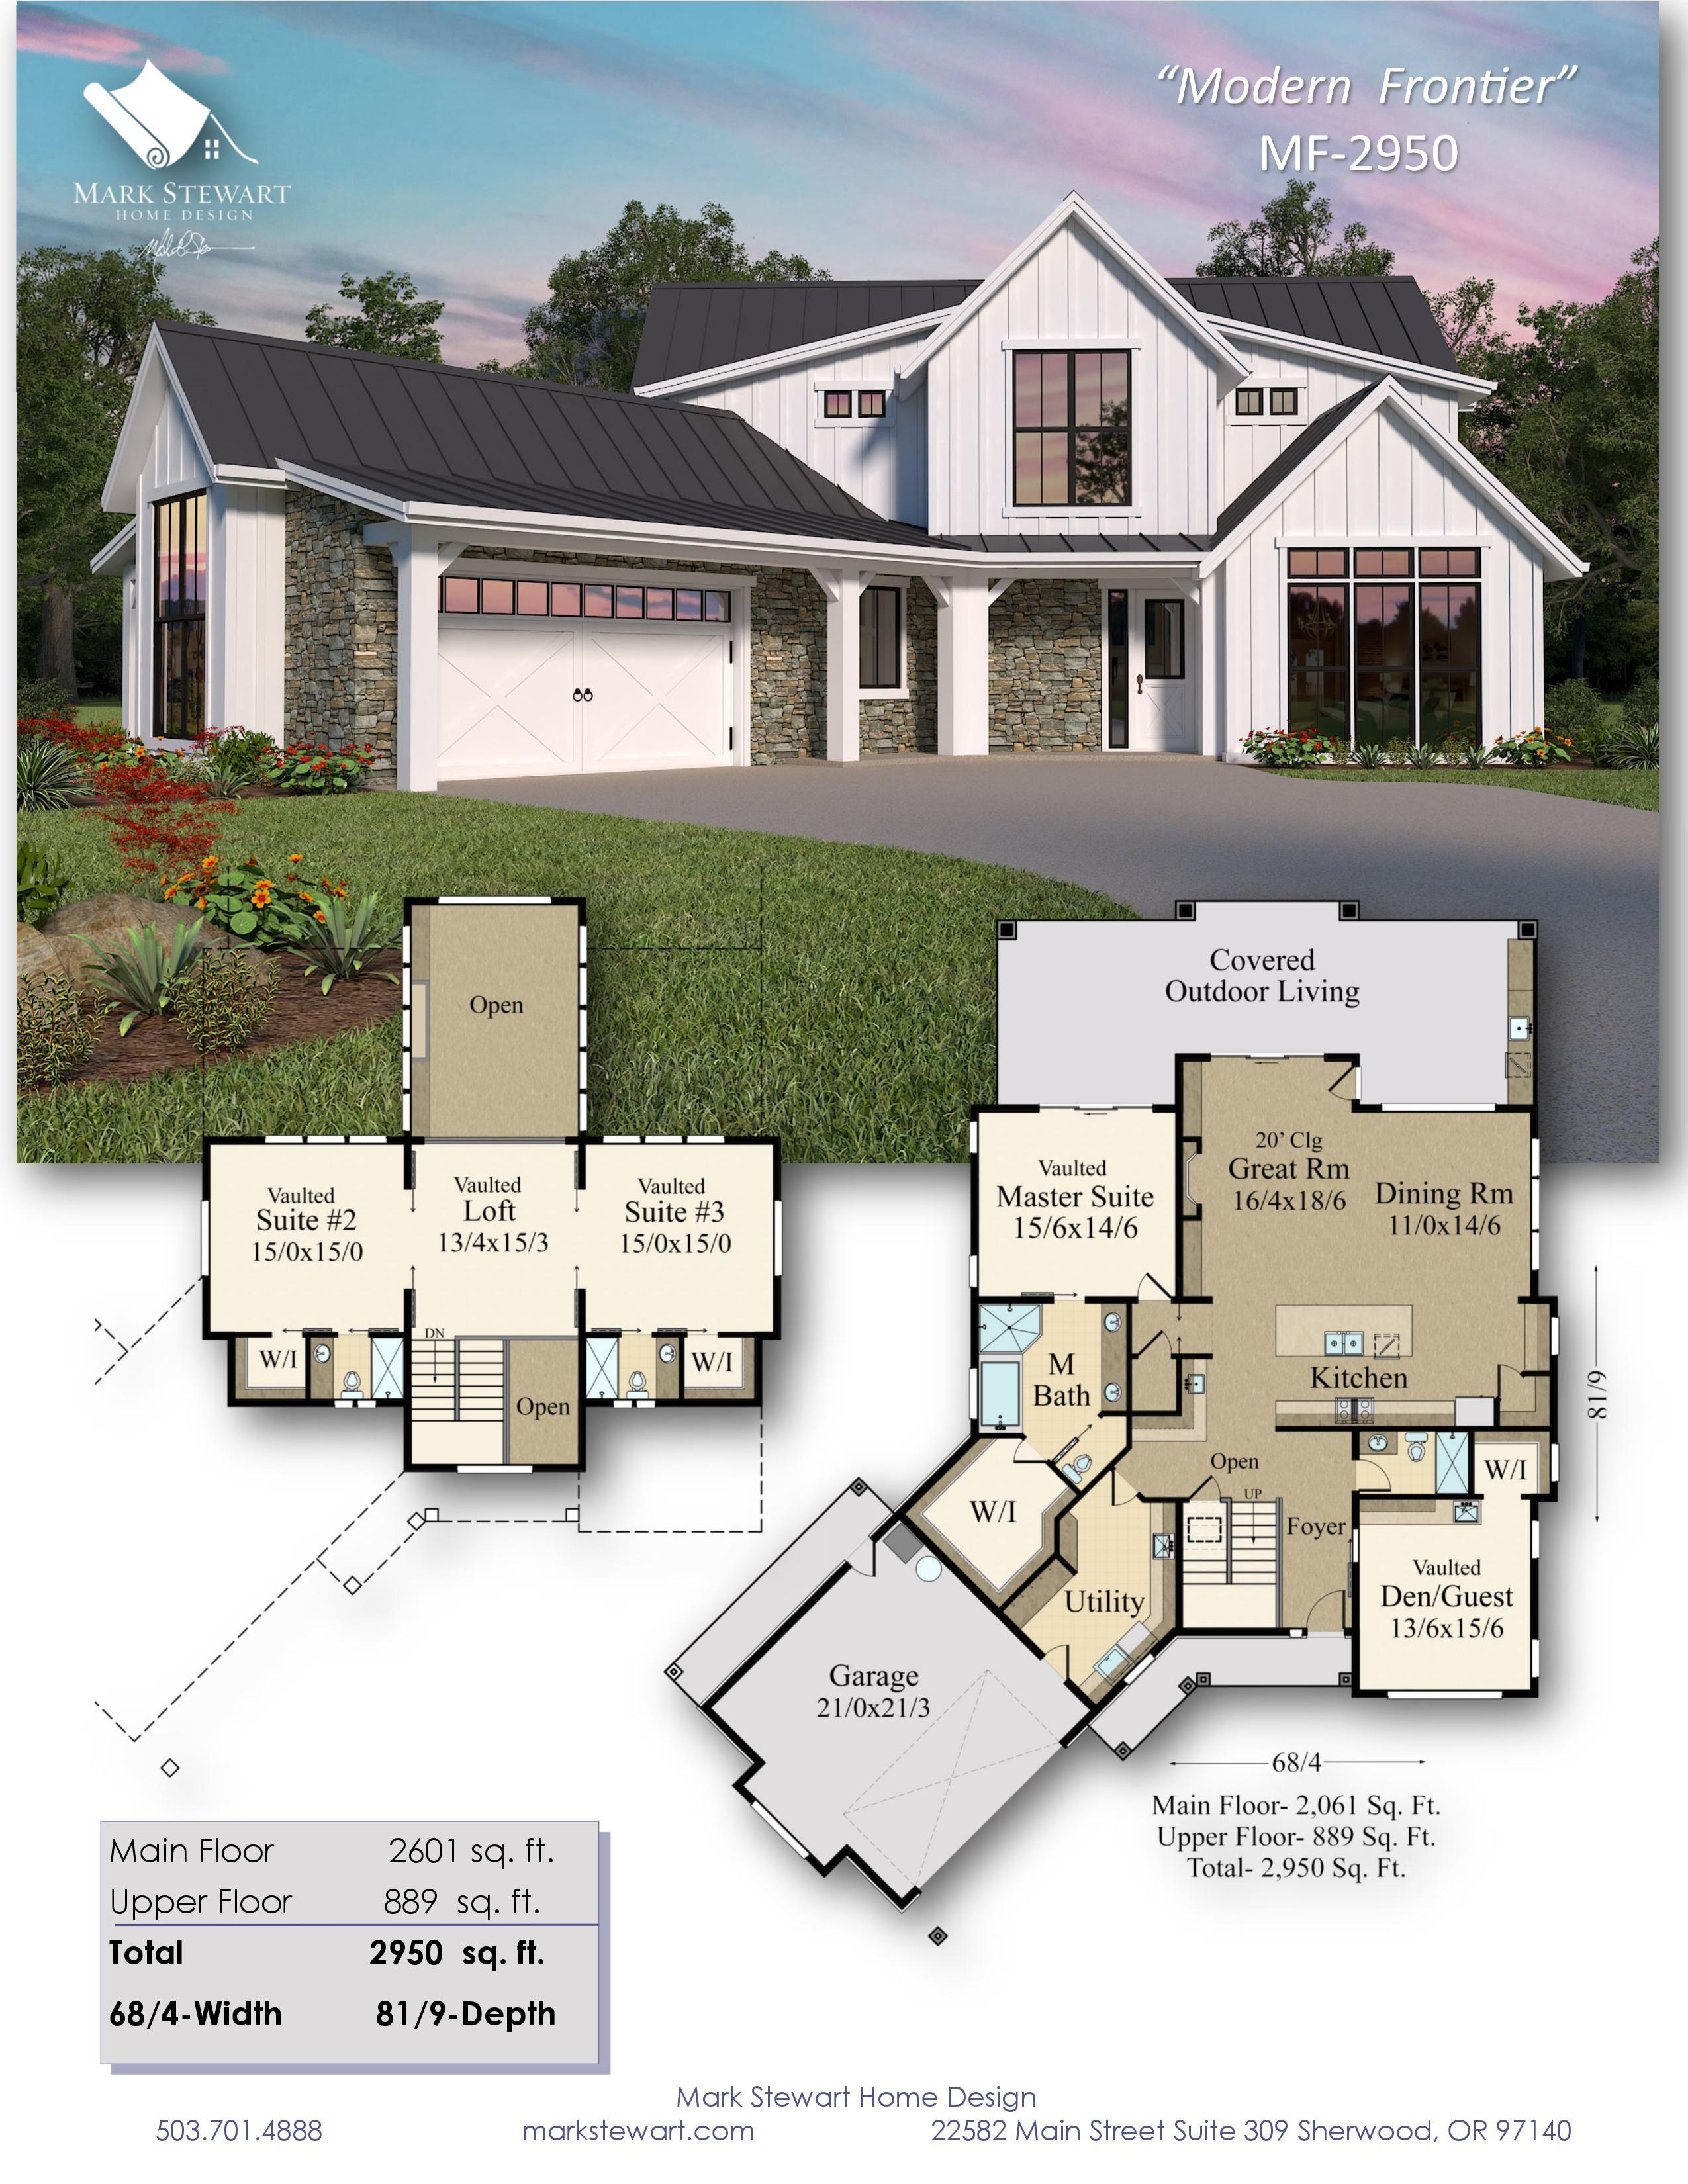 Modern Frontier Dream House Plans House Layout Plans Modern Farmhouse Plans